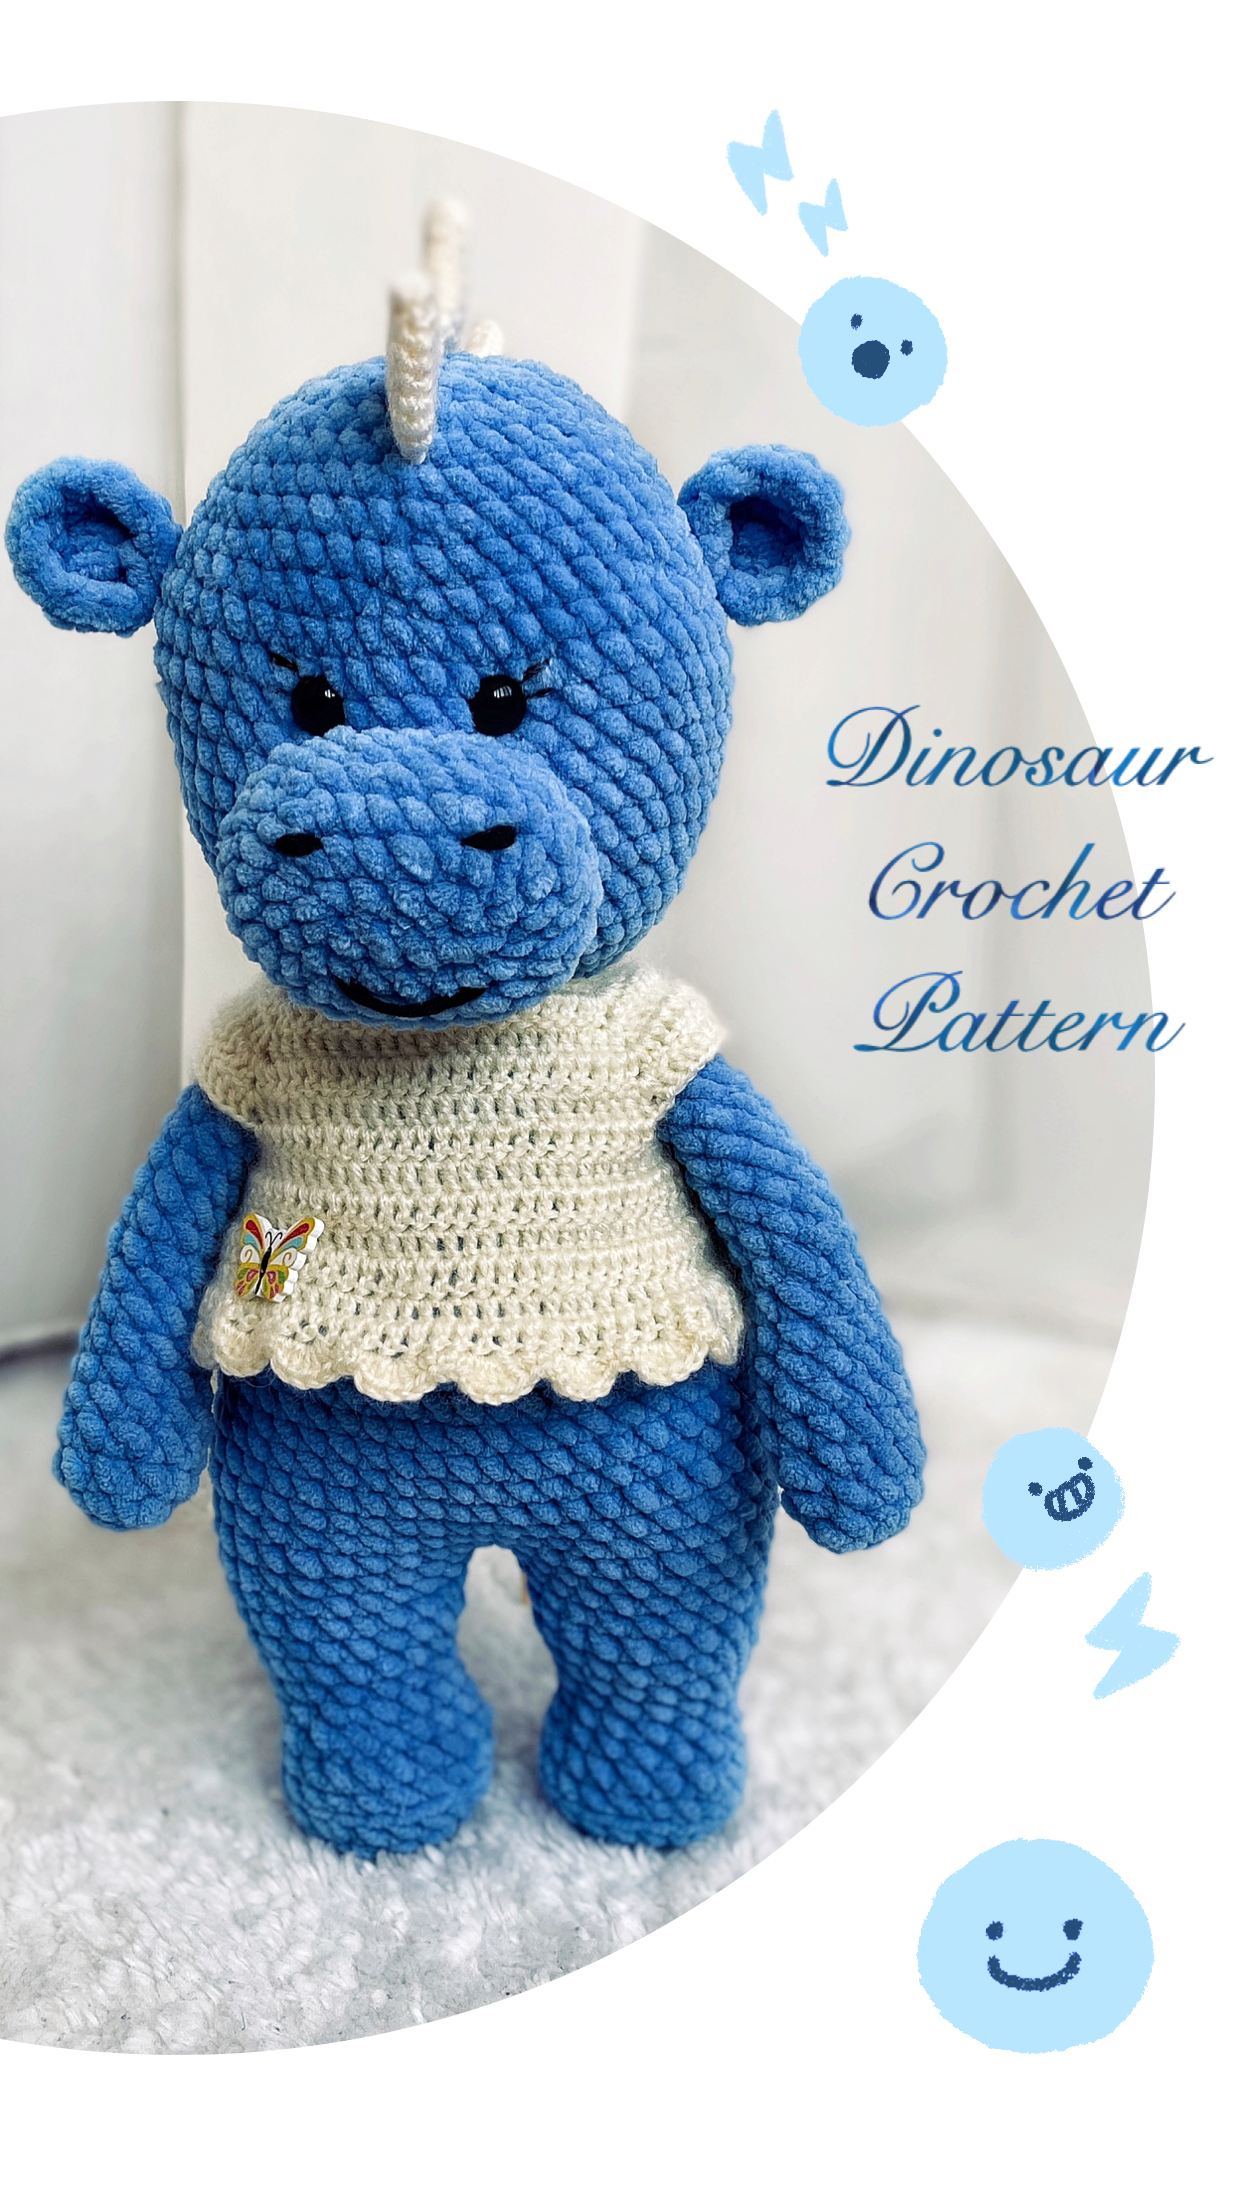 Crochet Blue Dragon Plush / Crochet Dinosaur Amigurumi | Etsy